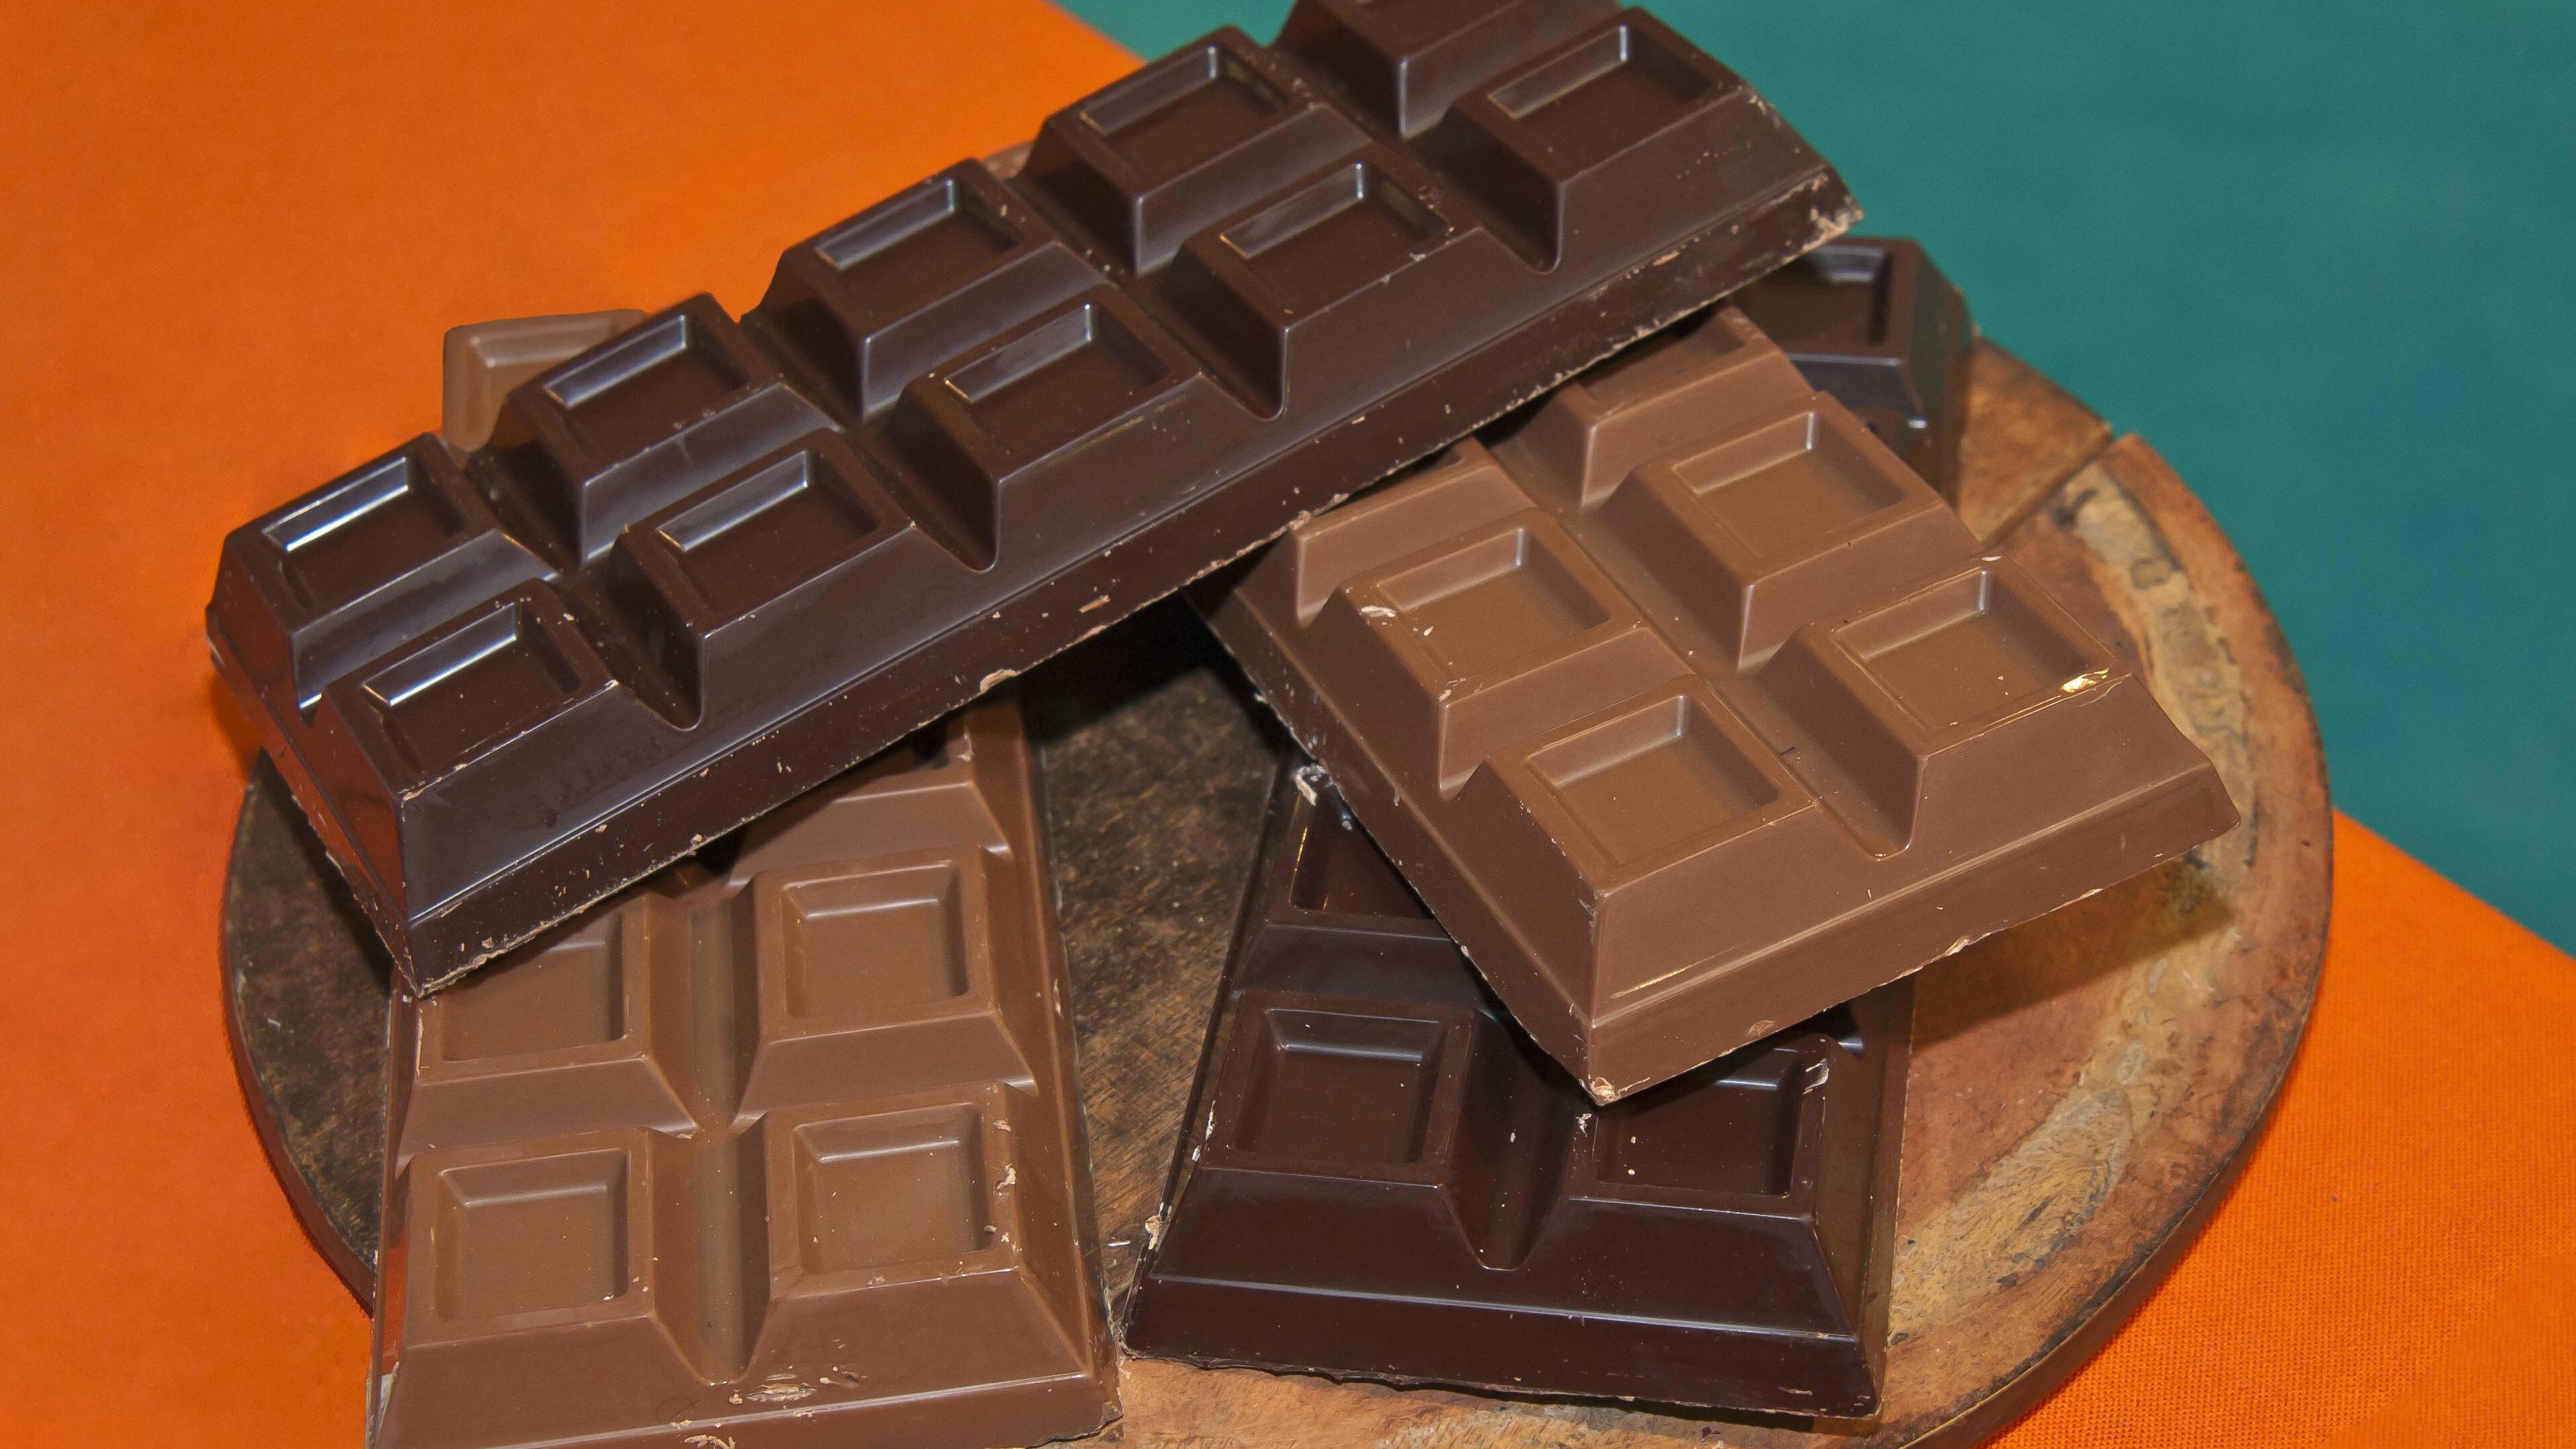 DIY-Pudding als Süßigkeit nach dem Festmahl